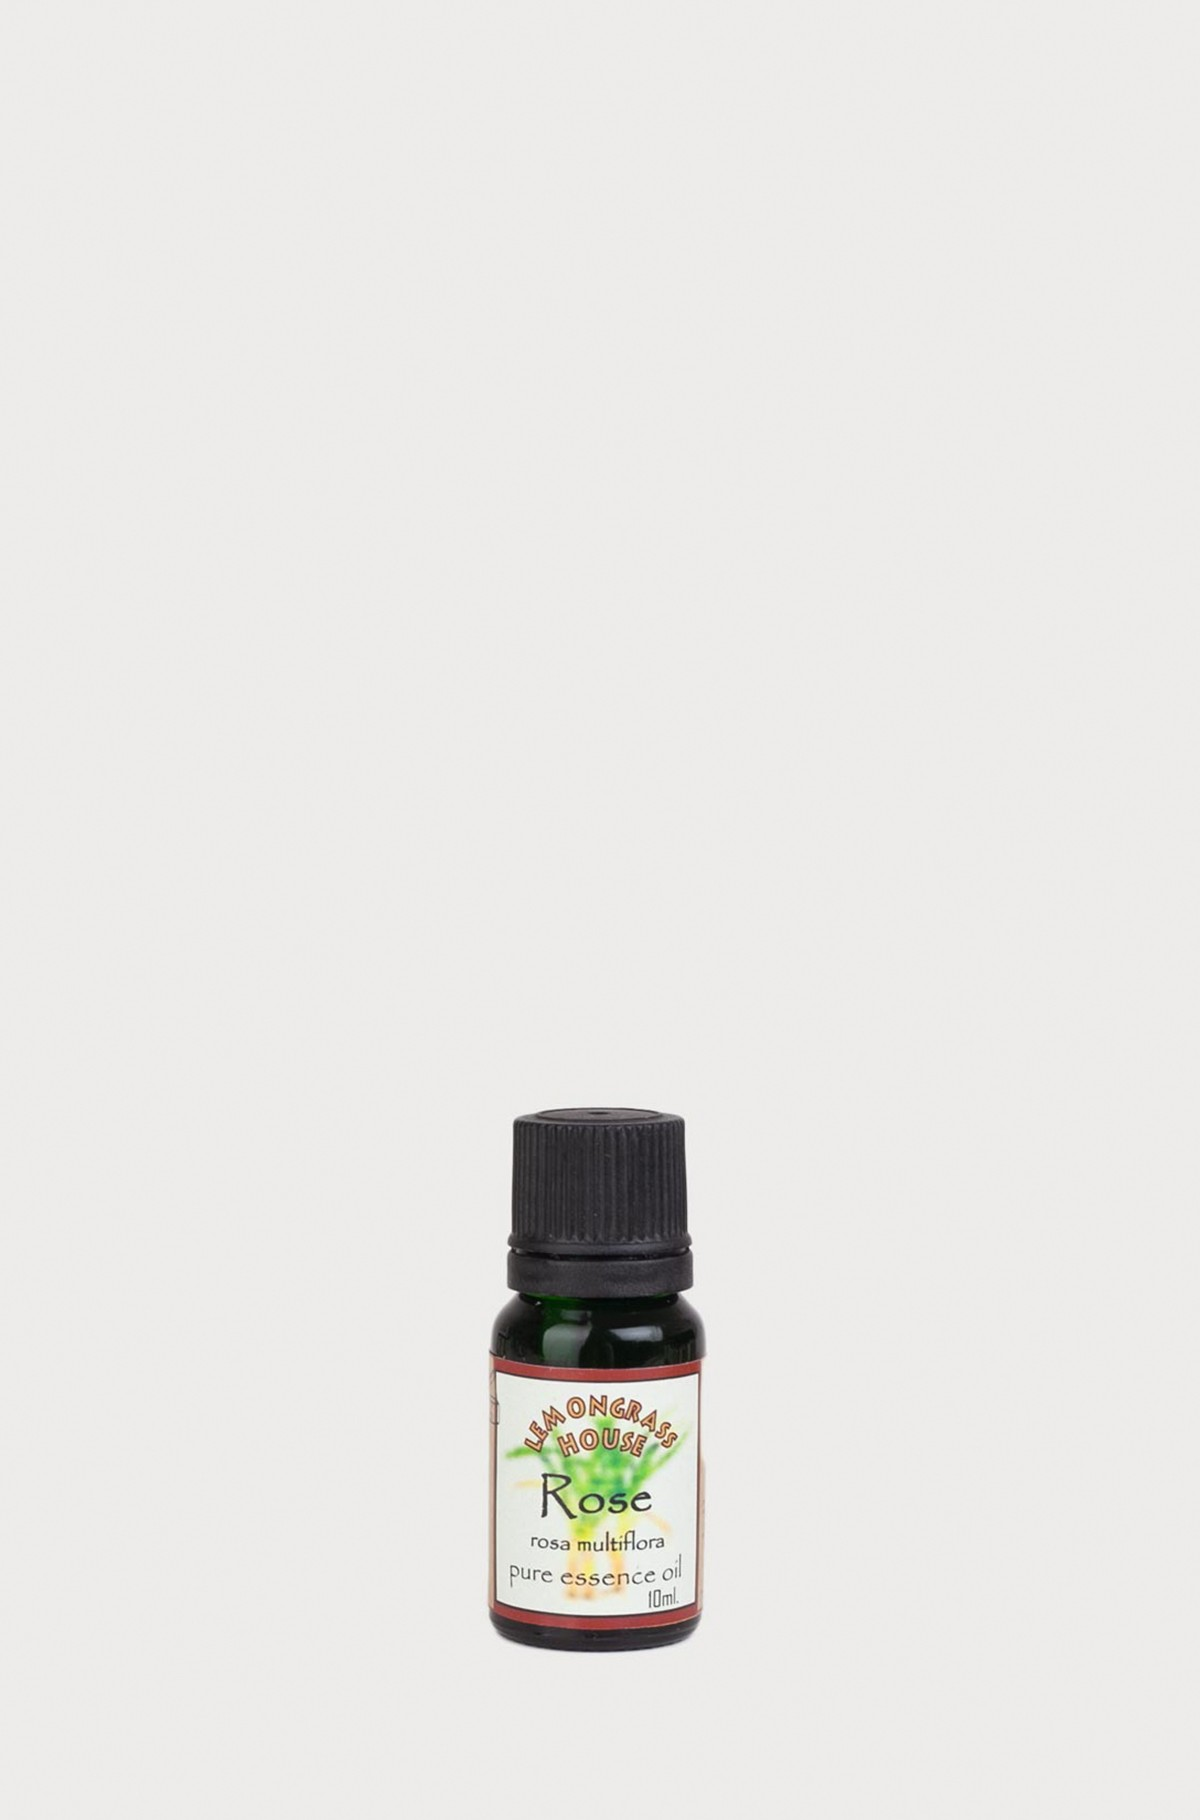 Eeterlik õli Rose 10ml-full-1